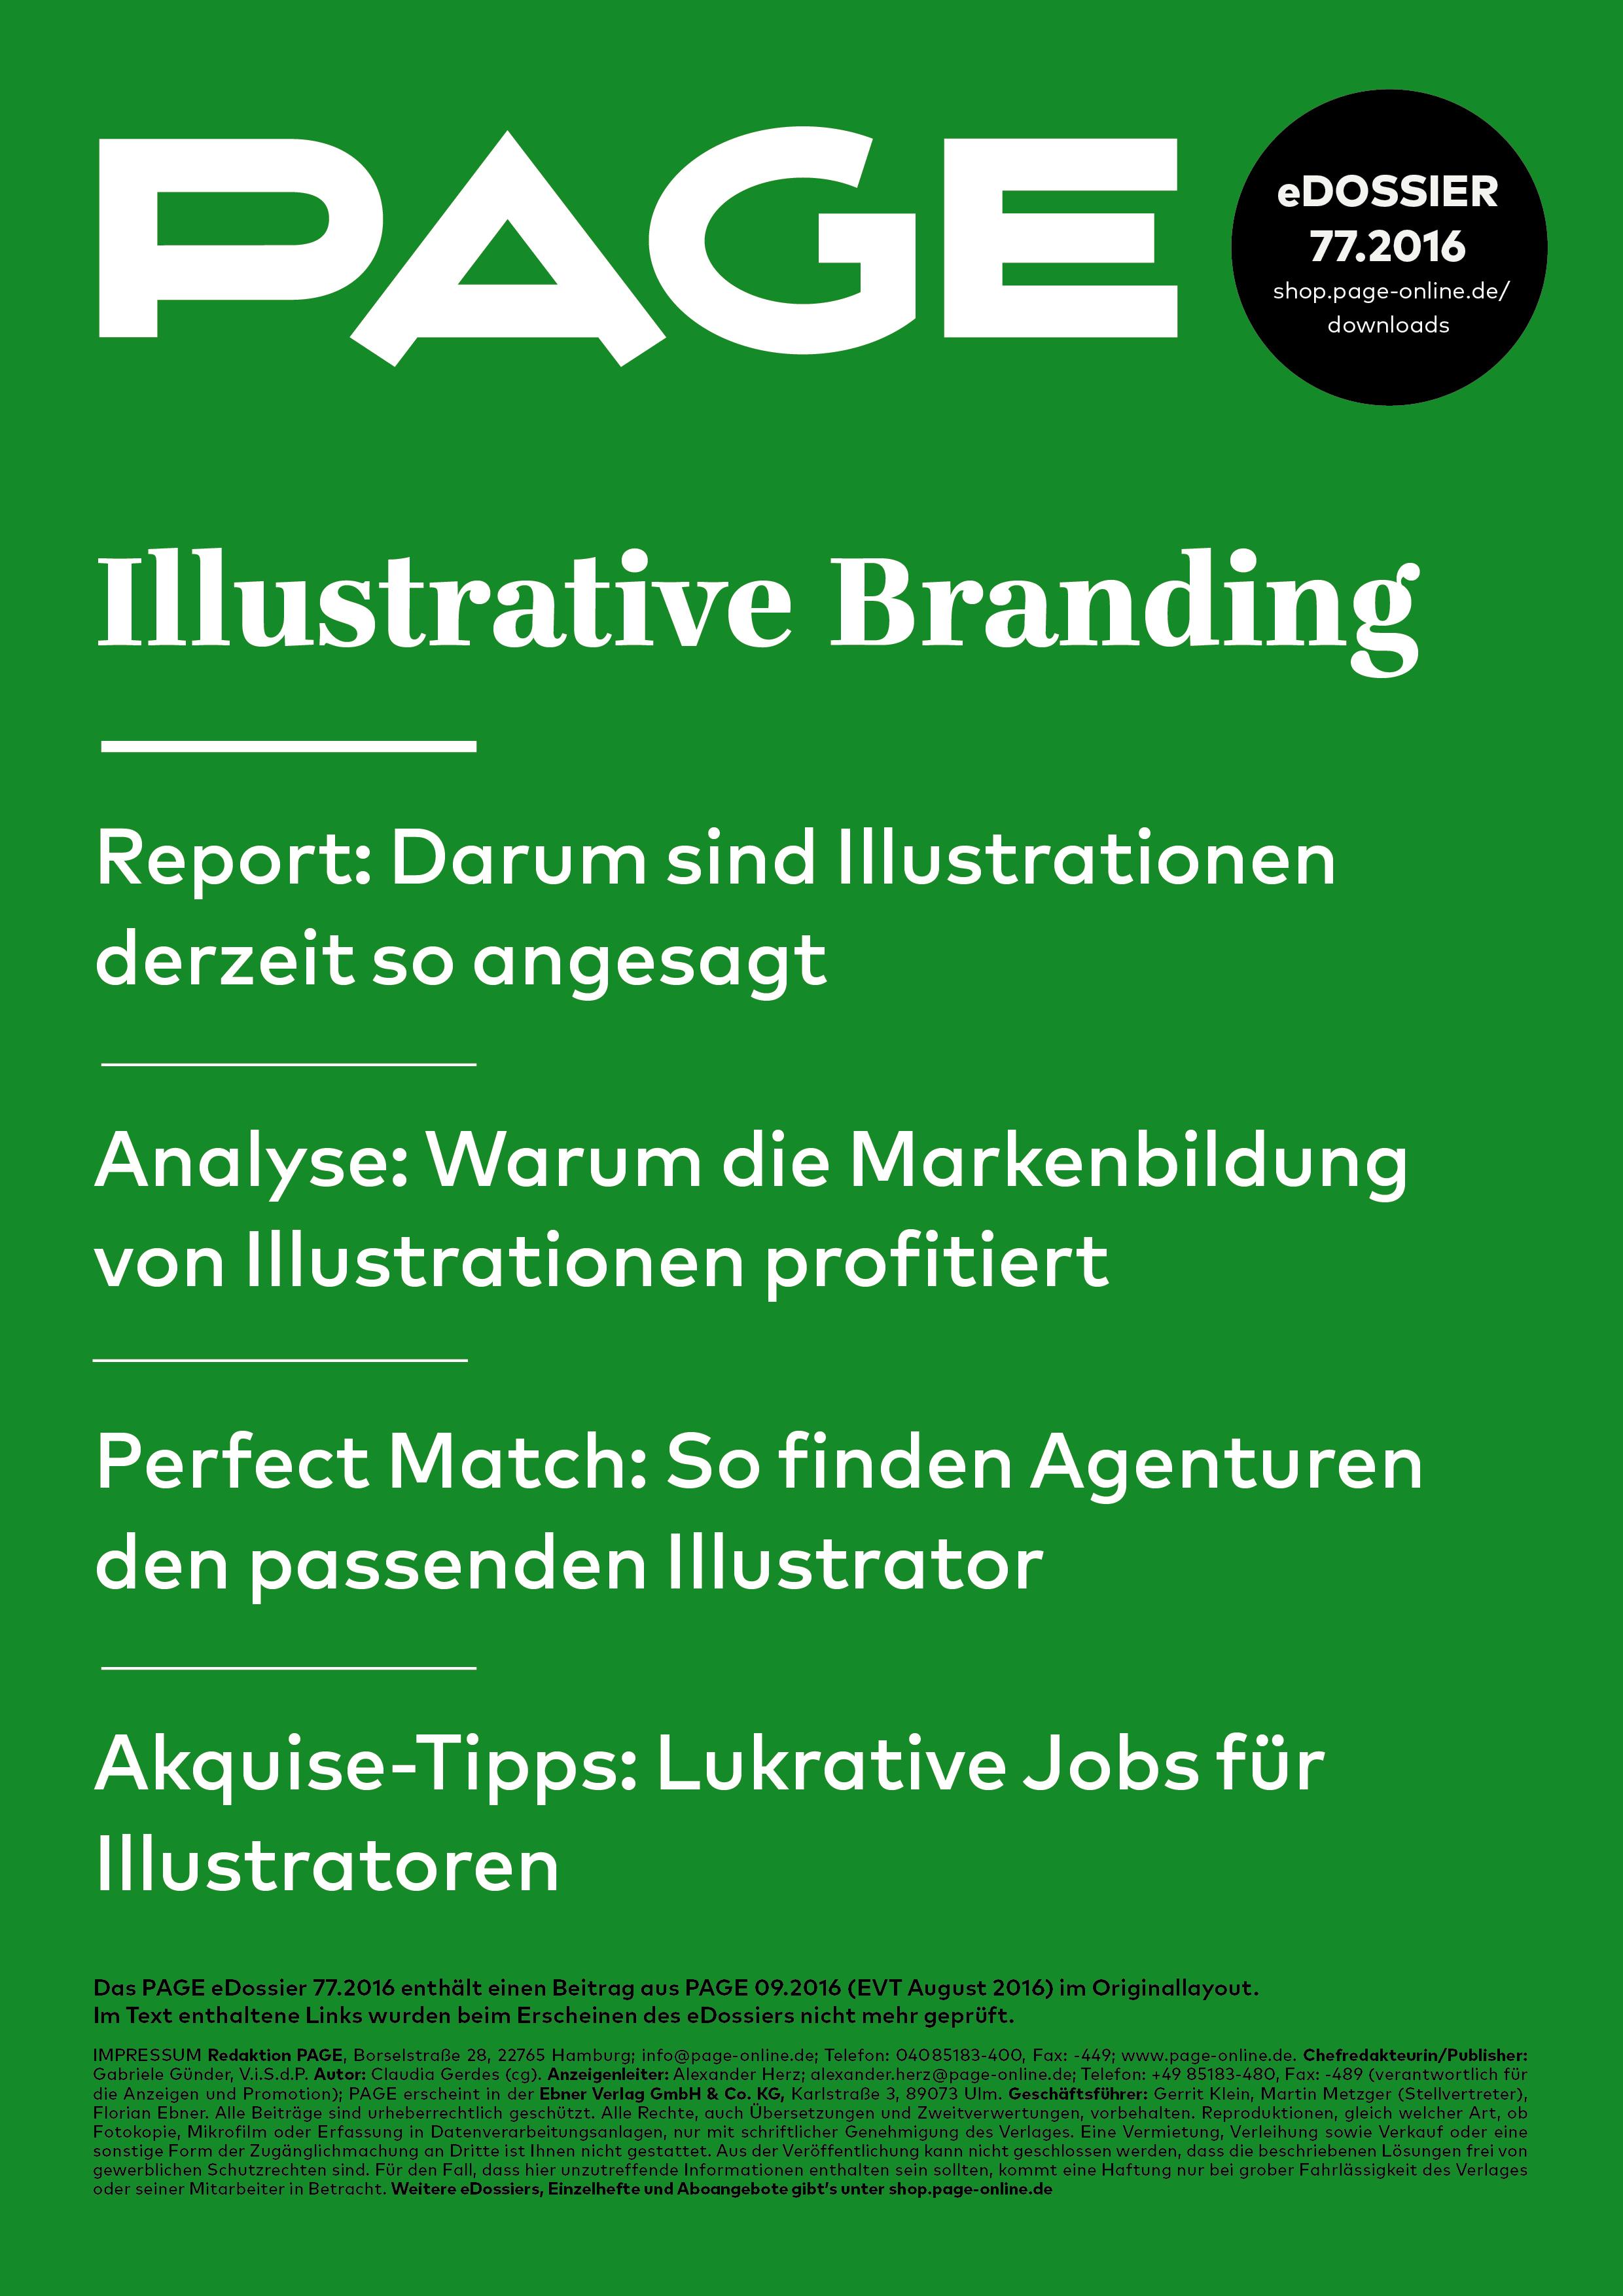 Branding, Illustration, Werbung, Kommunikationsdesign, kreative Berufe, Werbemittel, Verpackungsdesign, Grafikdesign